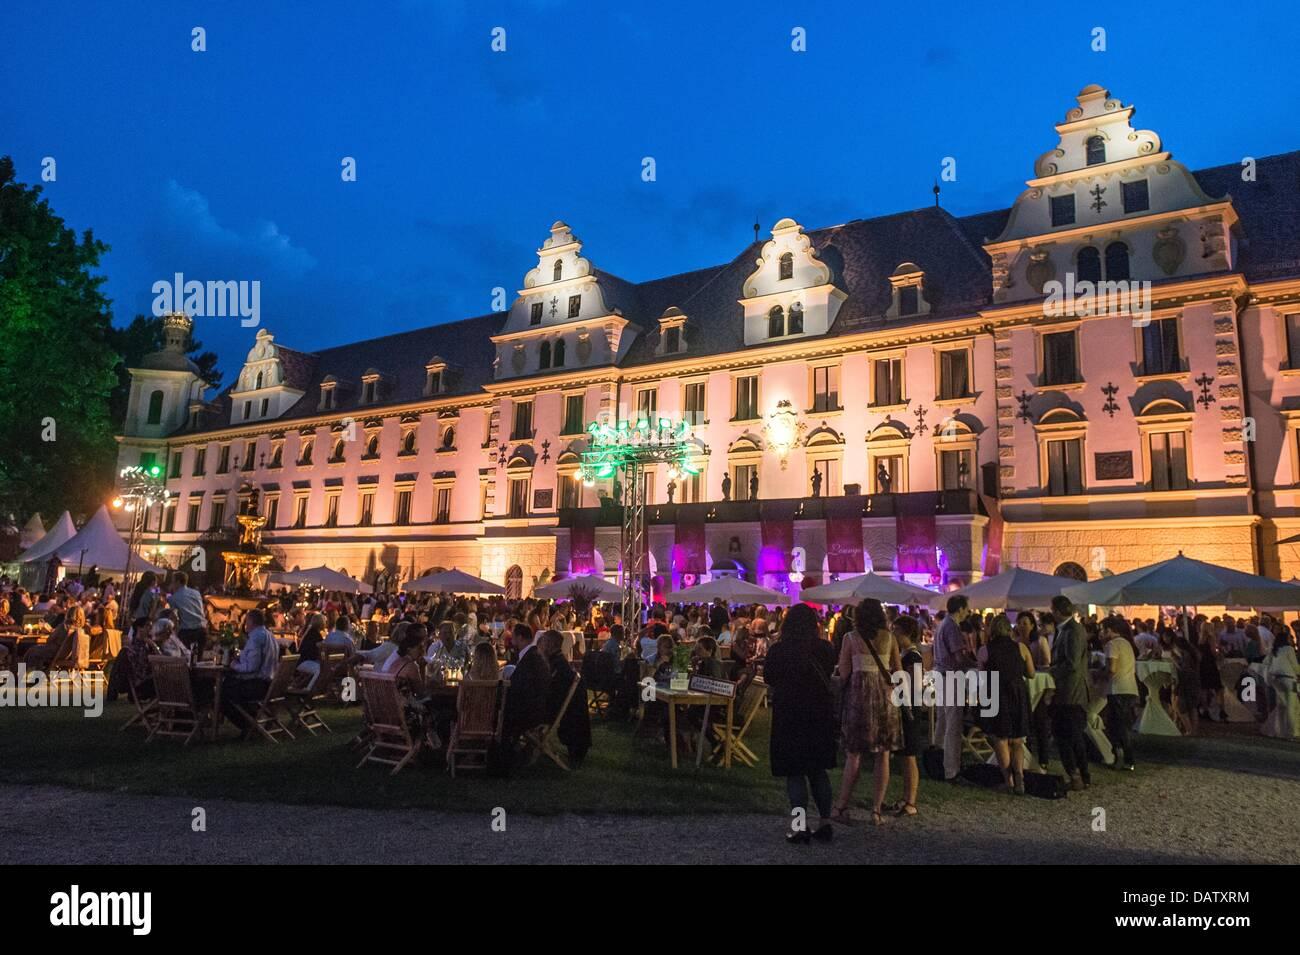 Eros Center Regensburg